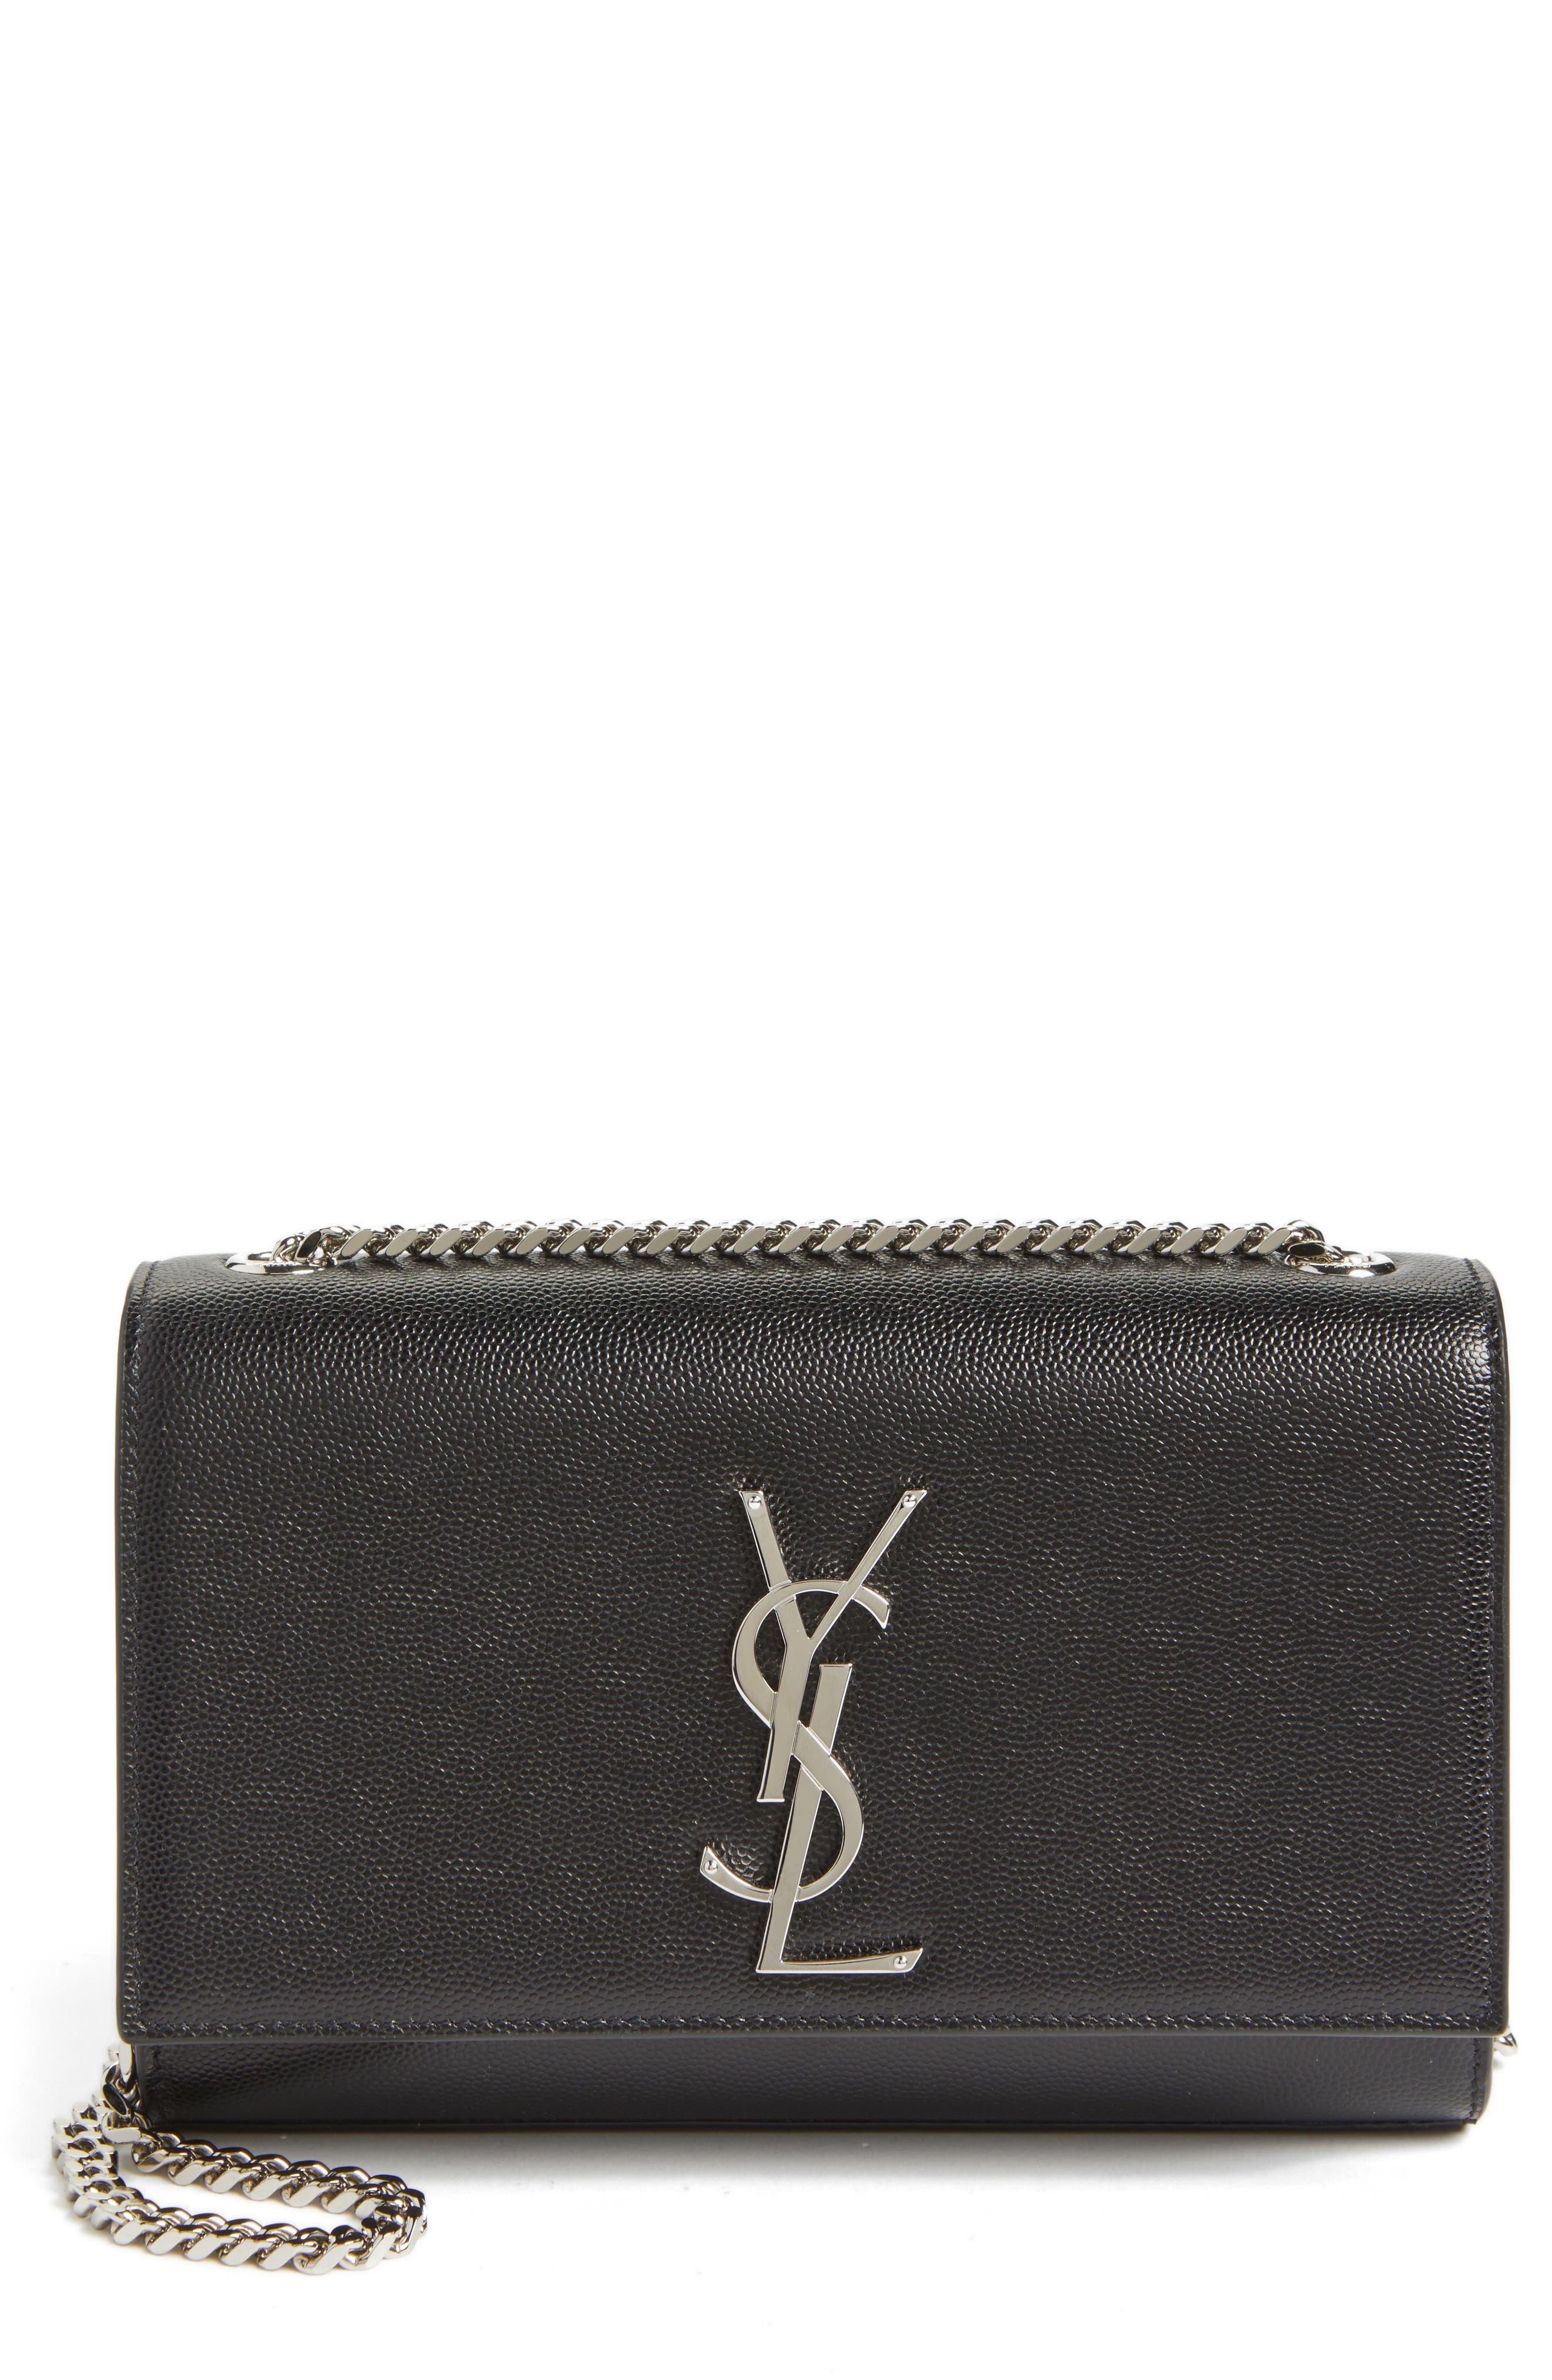 Small Kate Grained Leather Crossbody Bag, Main, color, NOIR